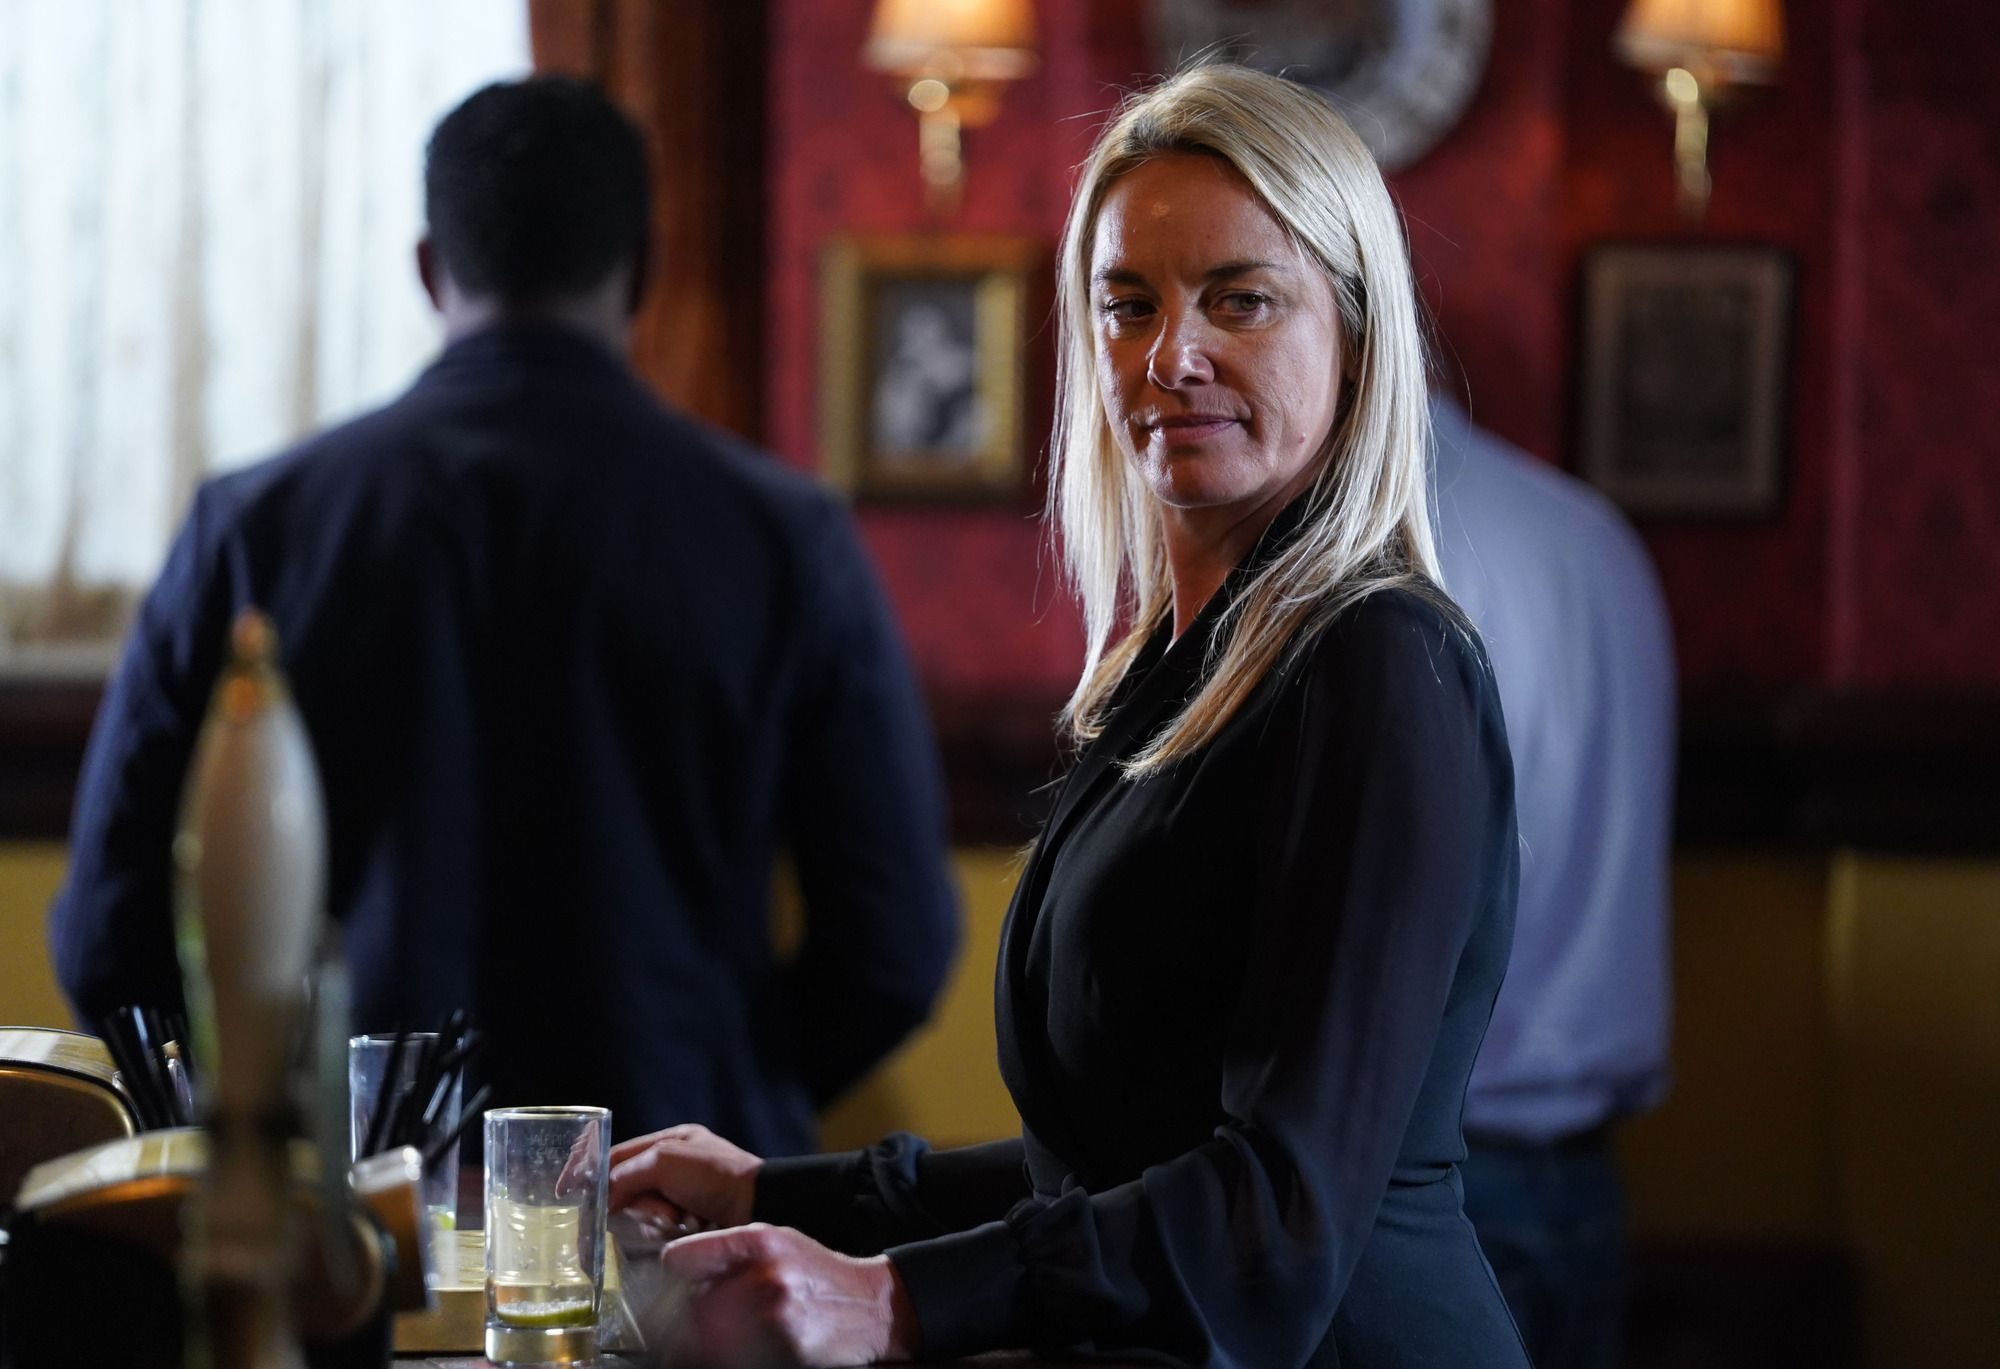 EastEnders: Hunter Owen's funeral sparks tensions in 32 new spoiler pictures